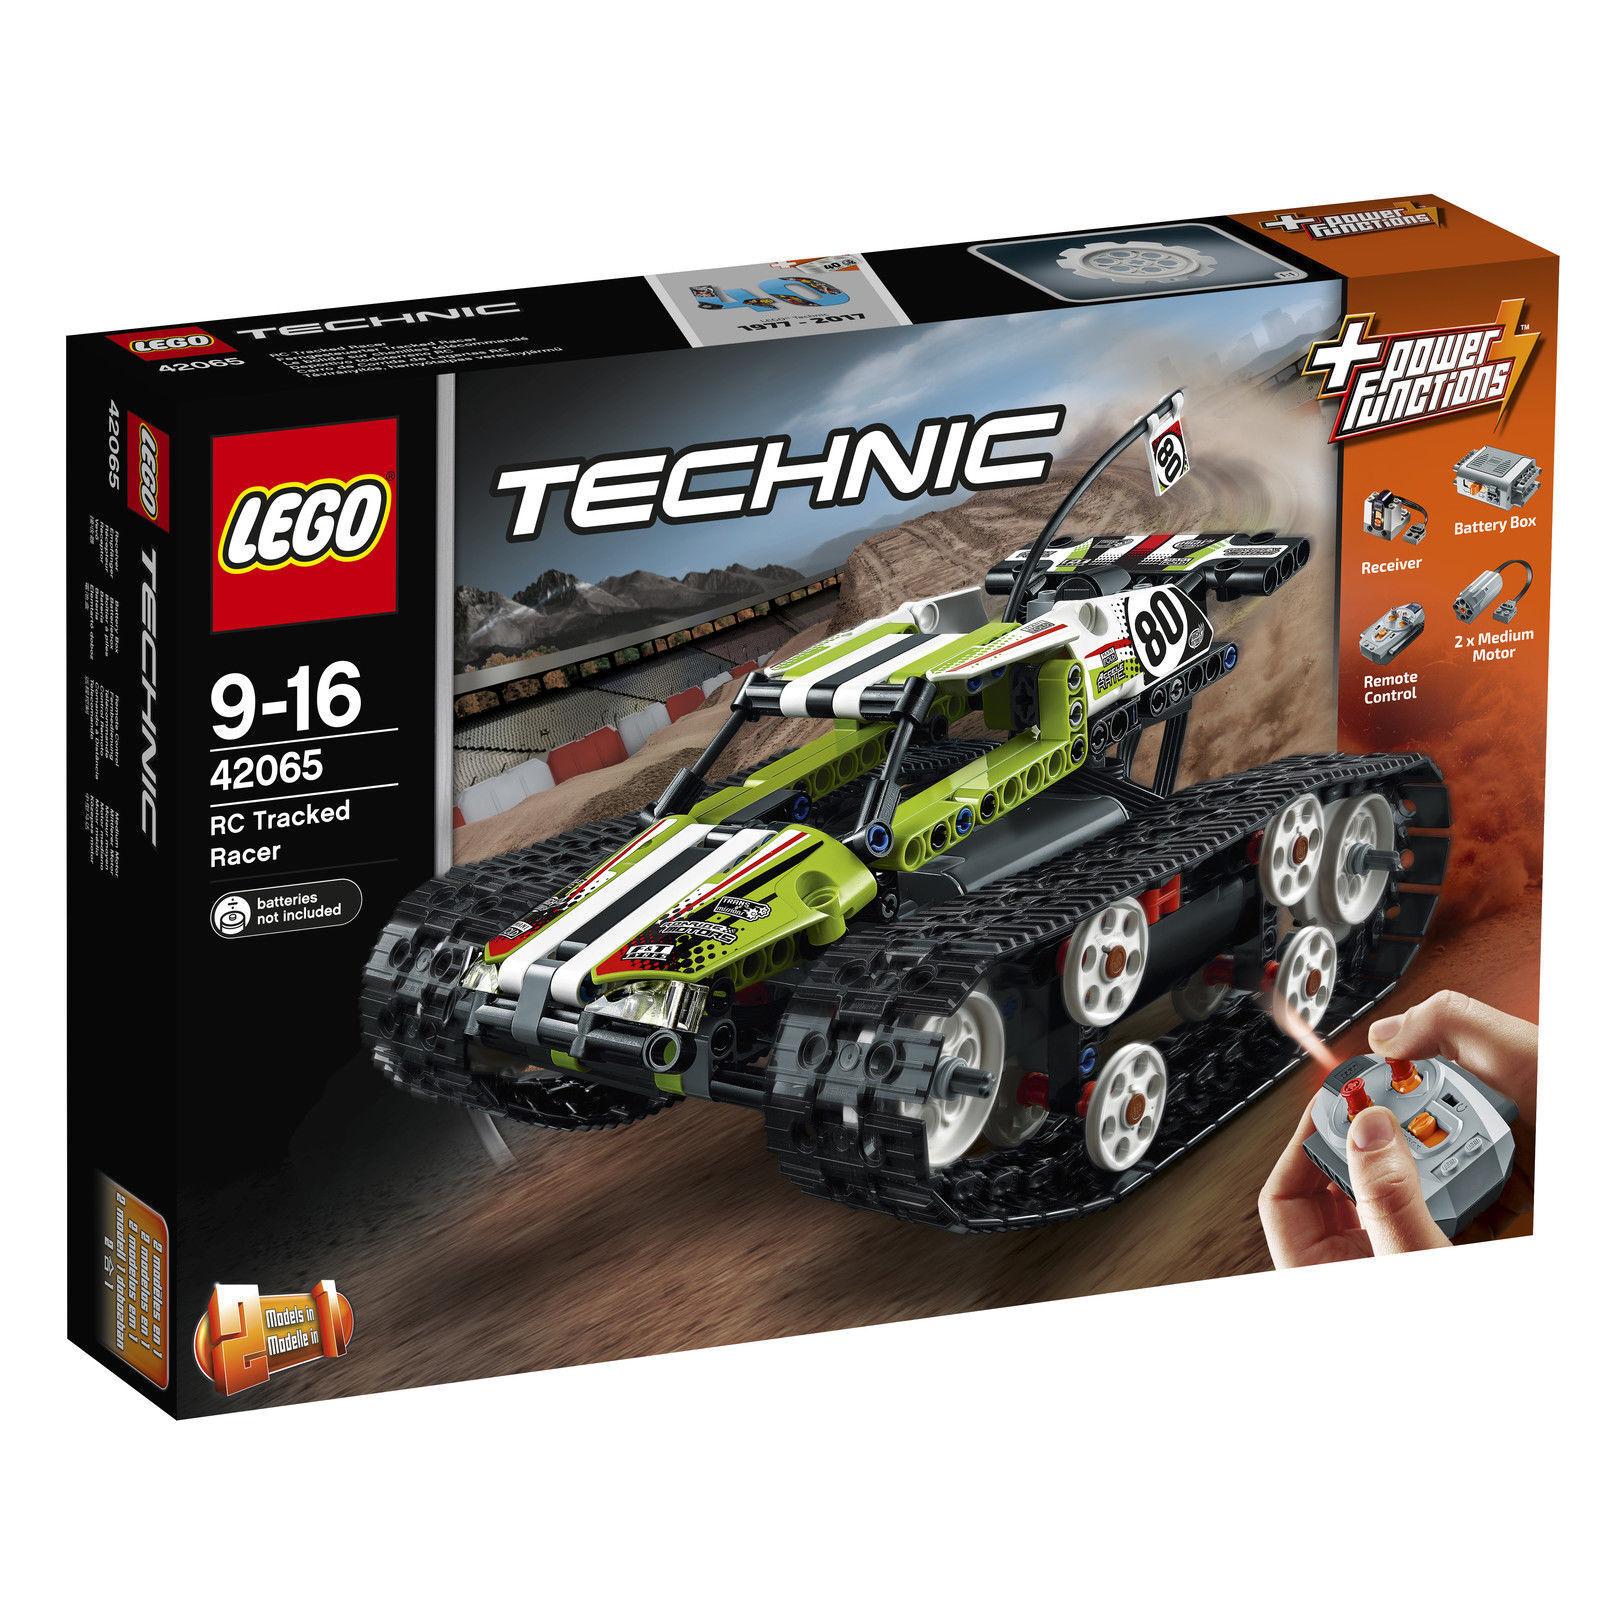 LEGO 42065 Technic Ferngesteuerter Tracked Racer NEU   OVP